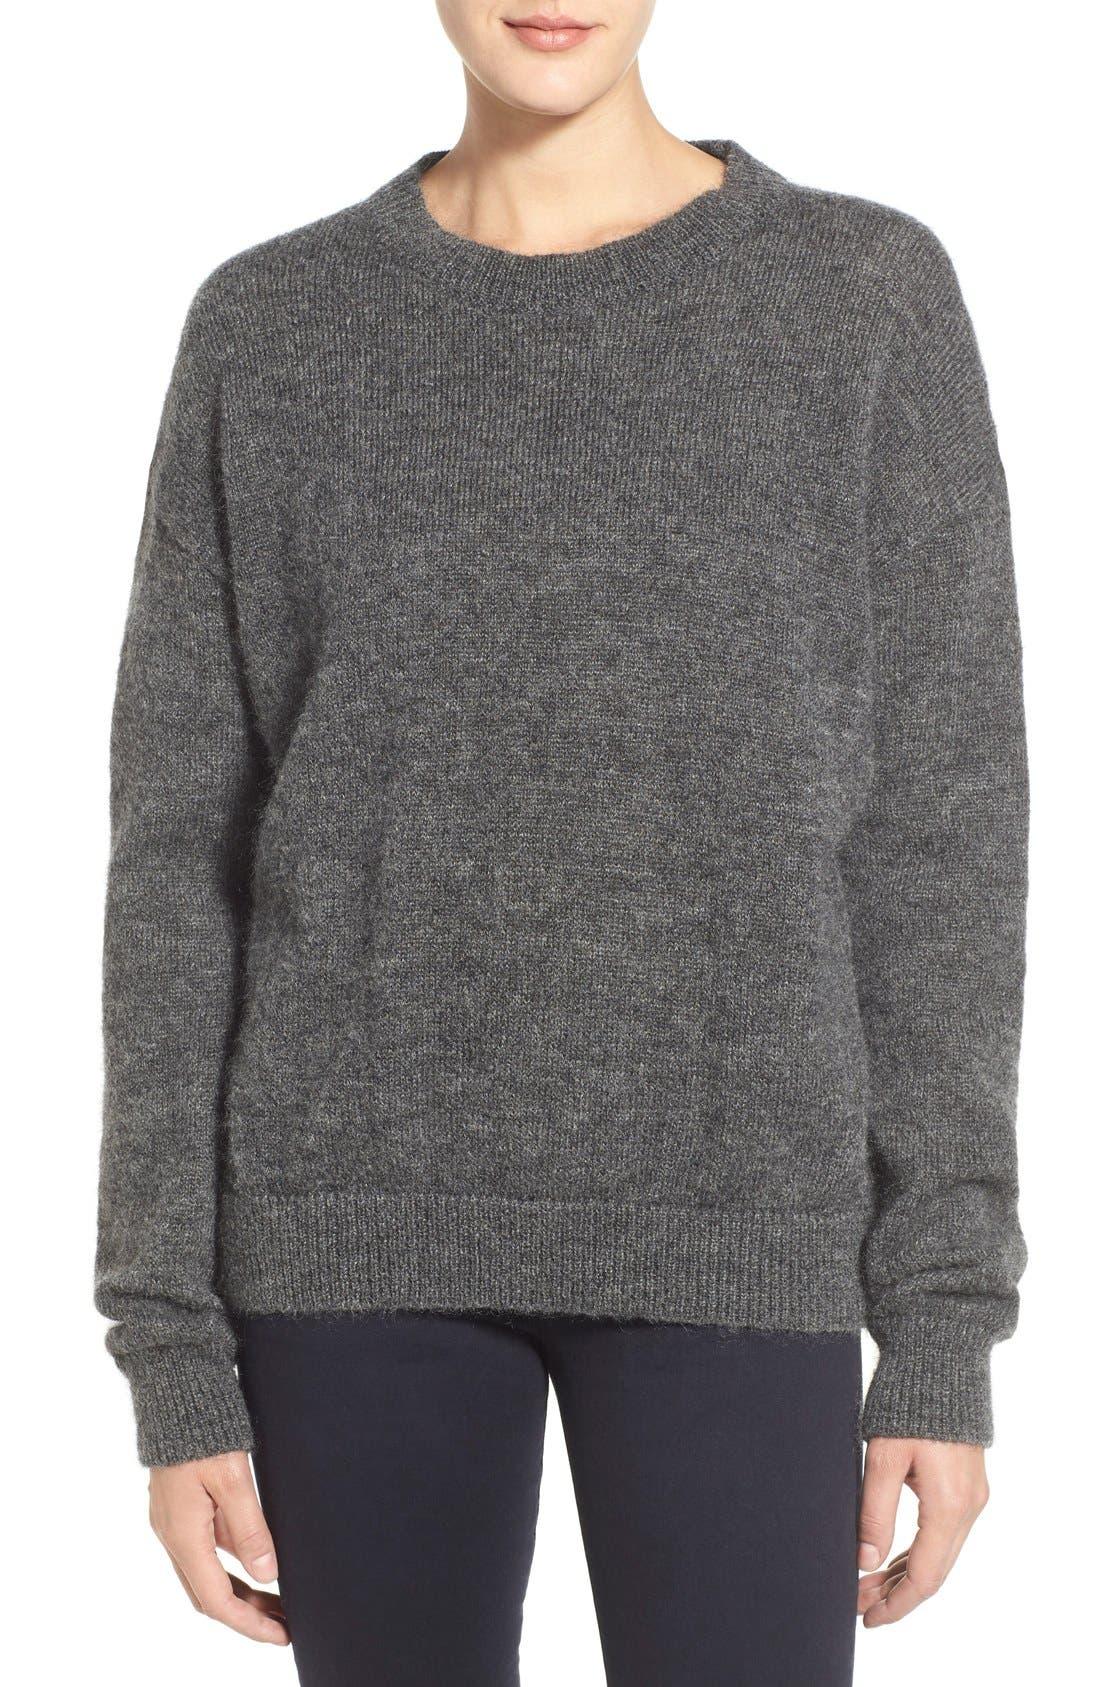 Alternate Image 1 Selected - M.i.h. Jeans 'Delo' Mohair Blend Crewneck Sweater